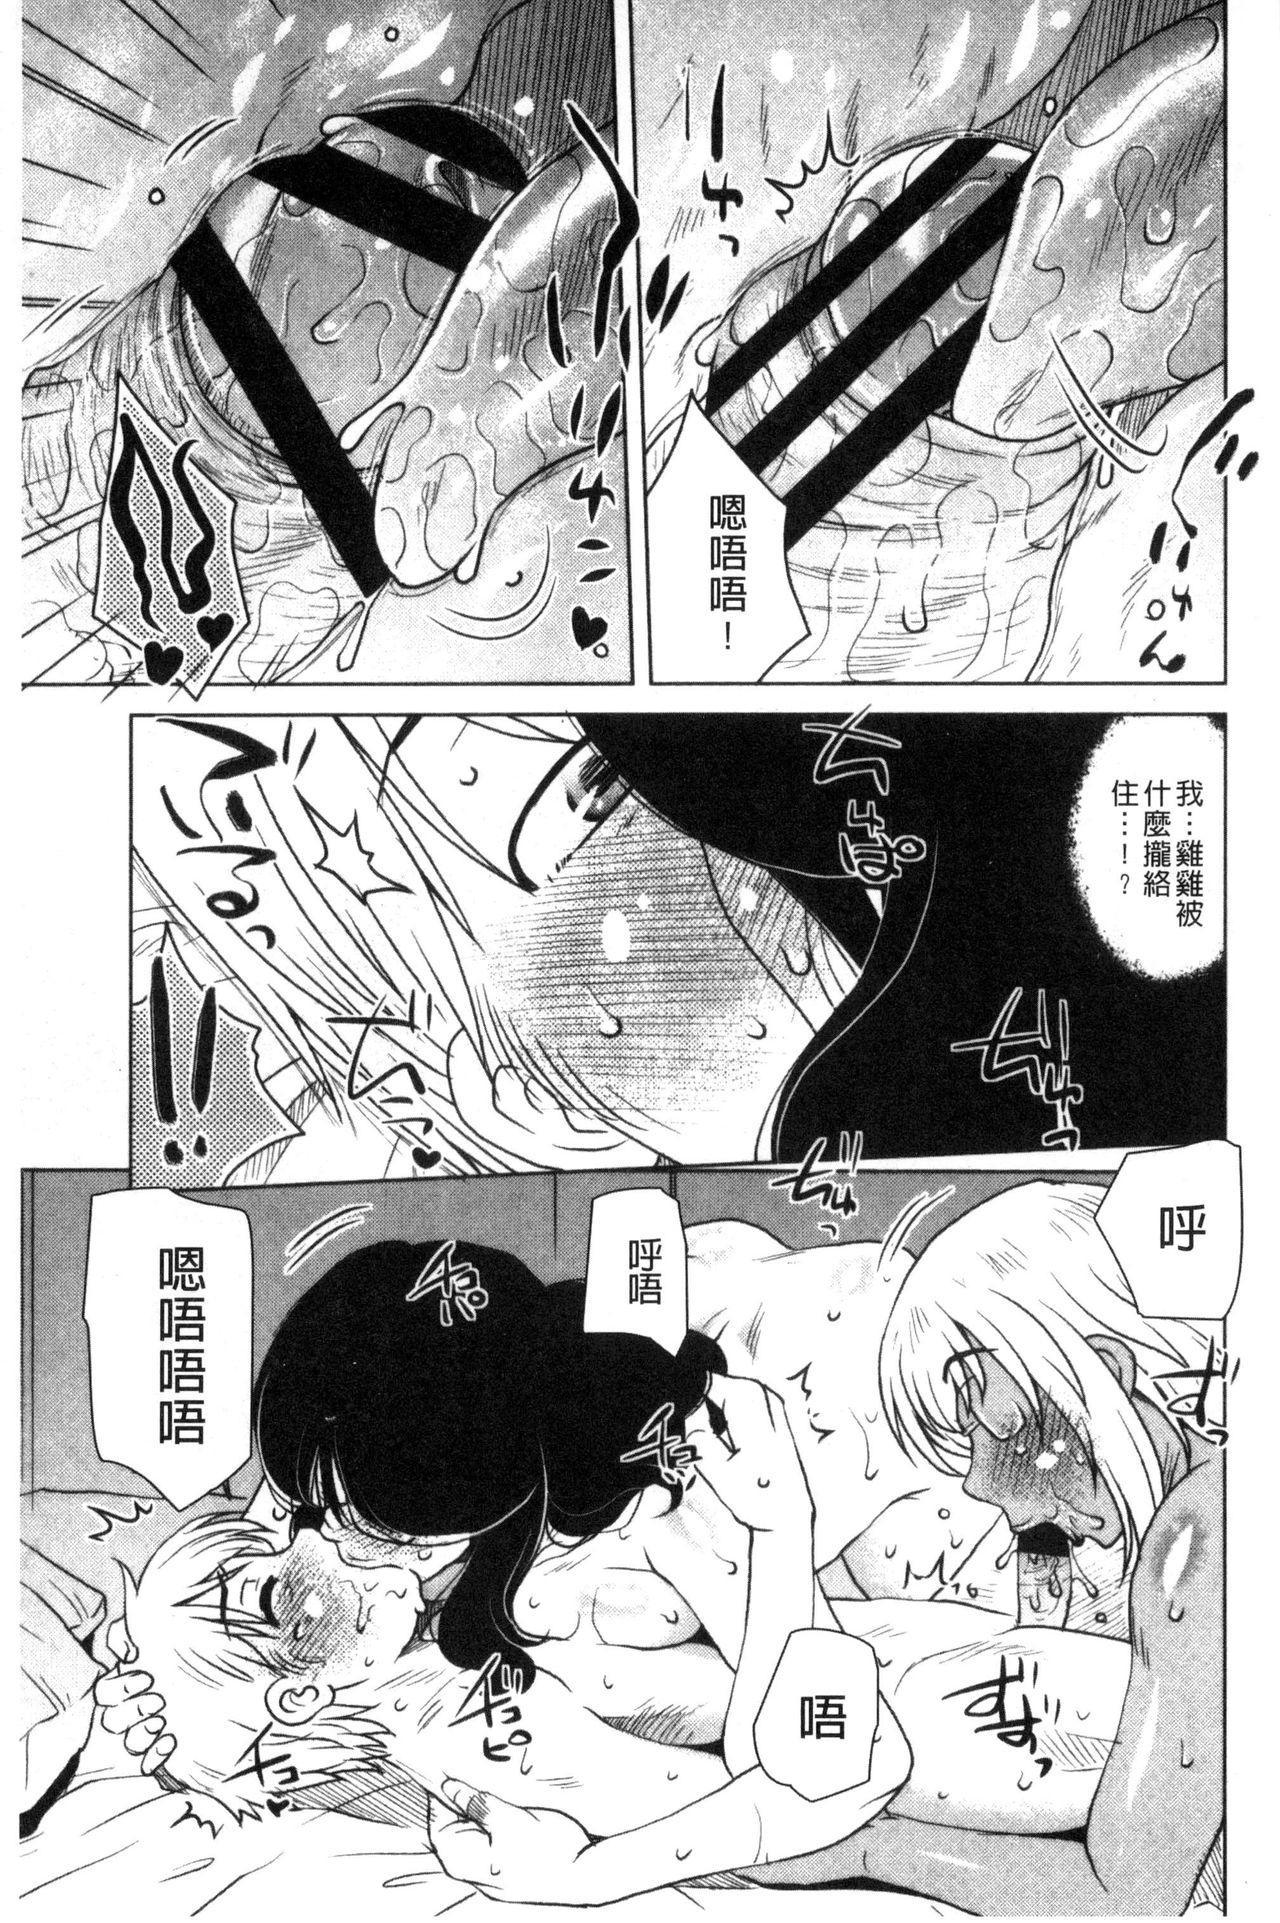 [Kurumiya Mashimin] Uchi no Shachou no Hamedere Inkatsu - Our President is HAME-DERE in Licentious sex life. [Chinese] 93